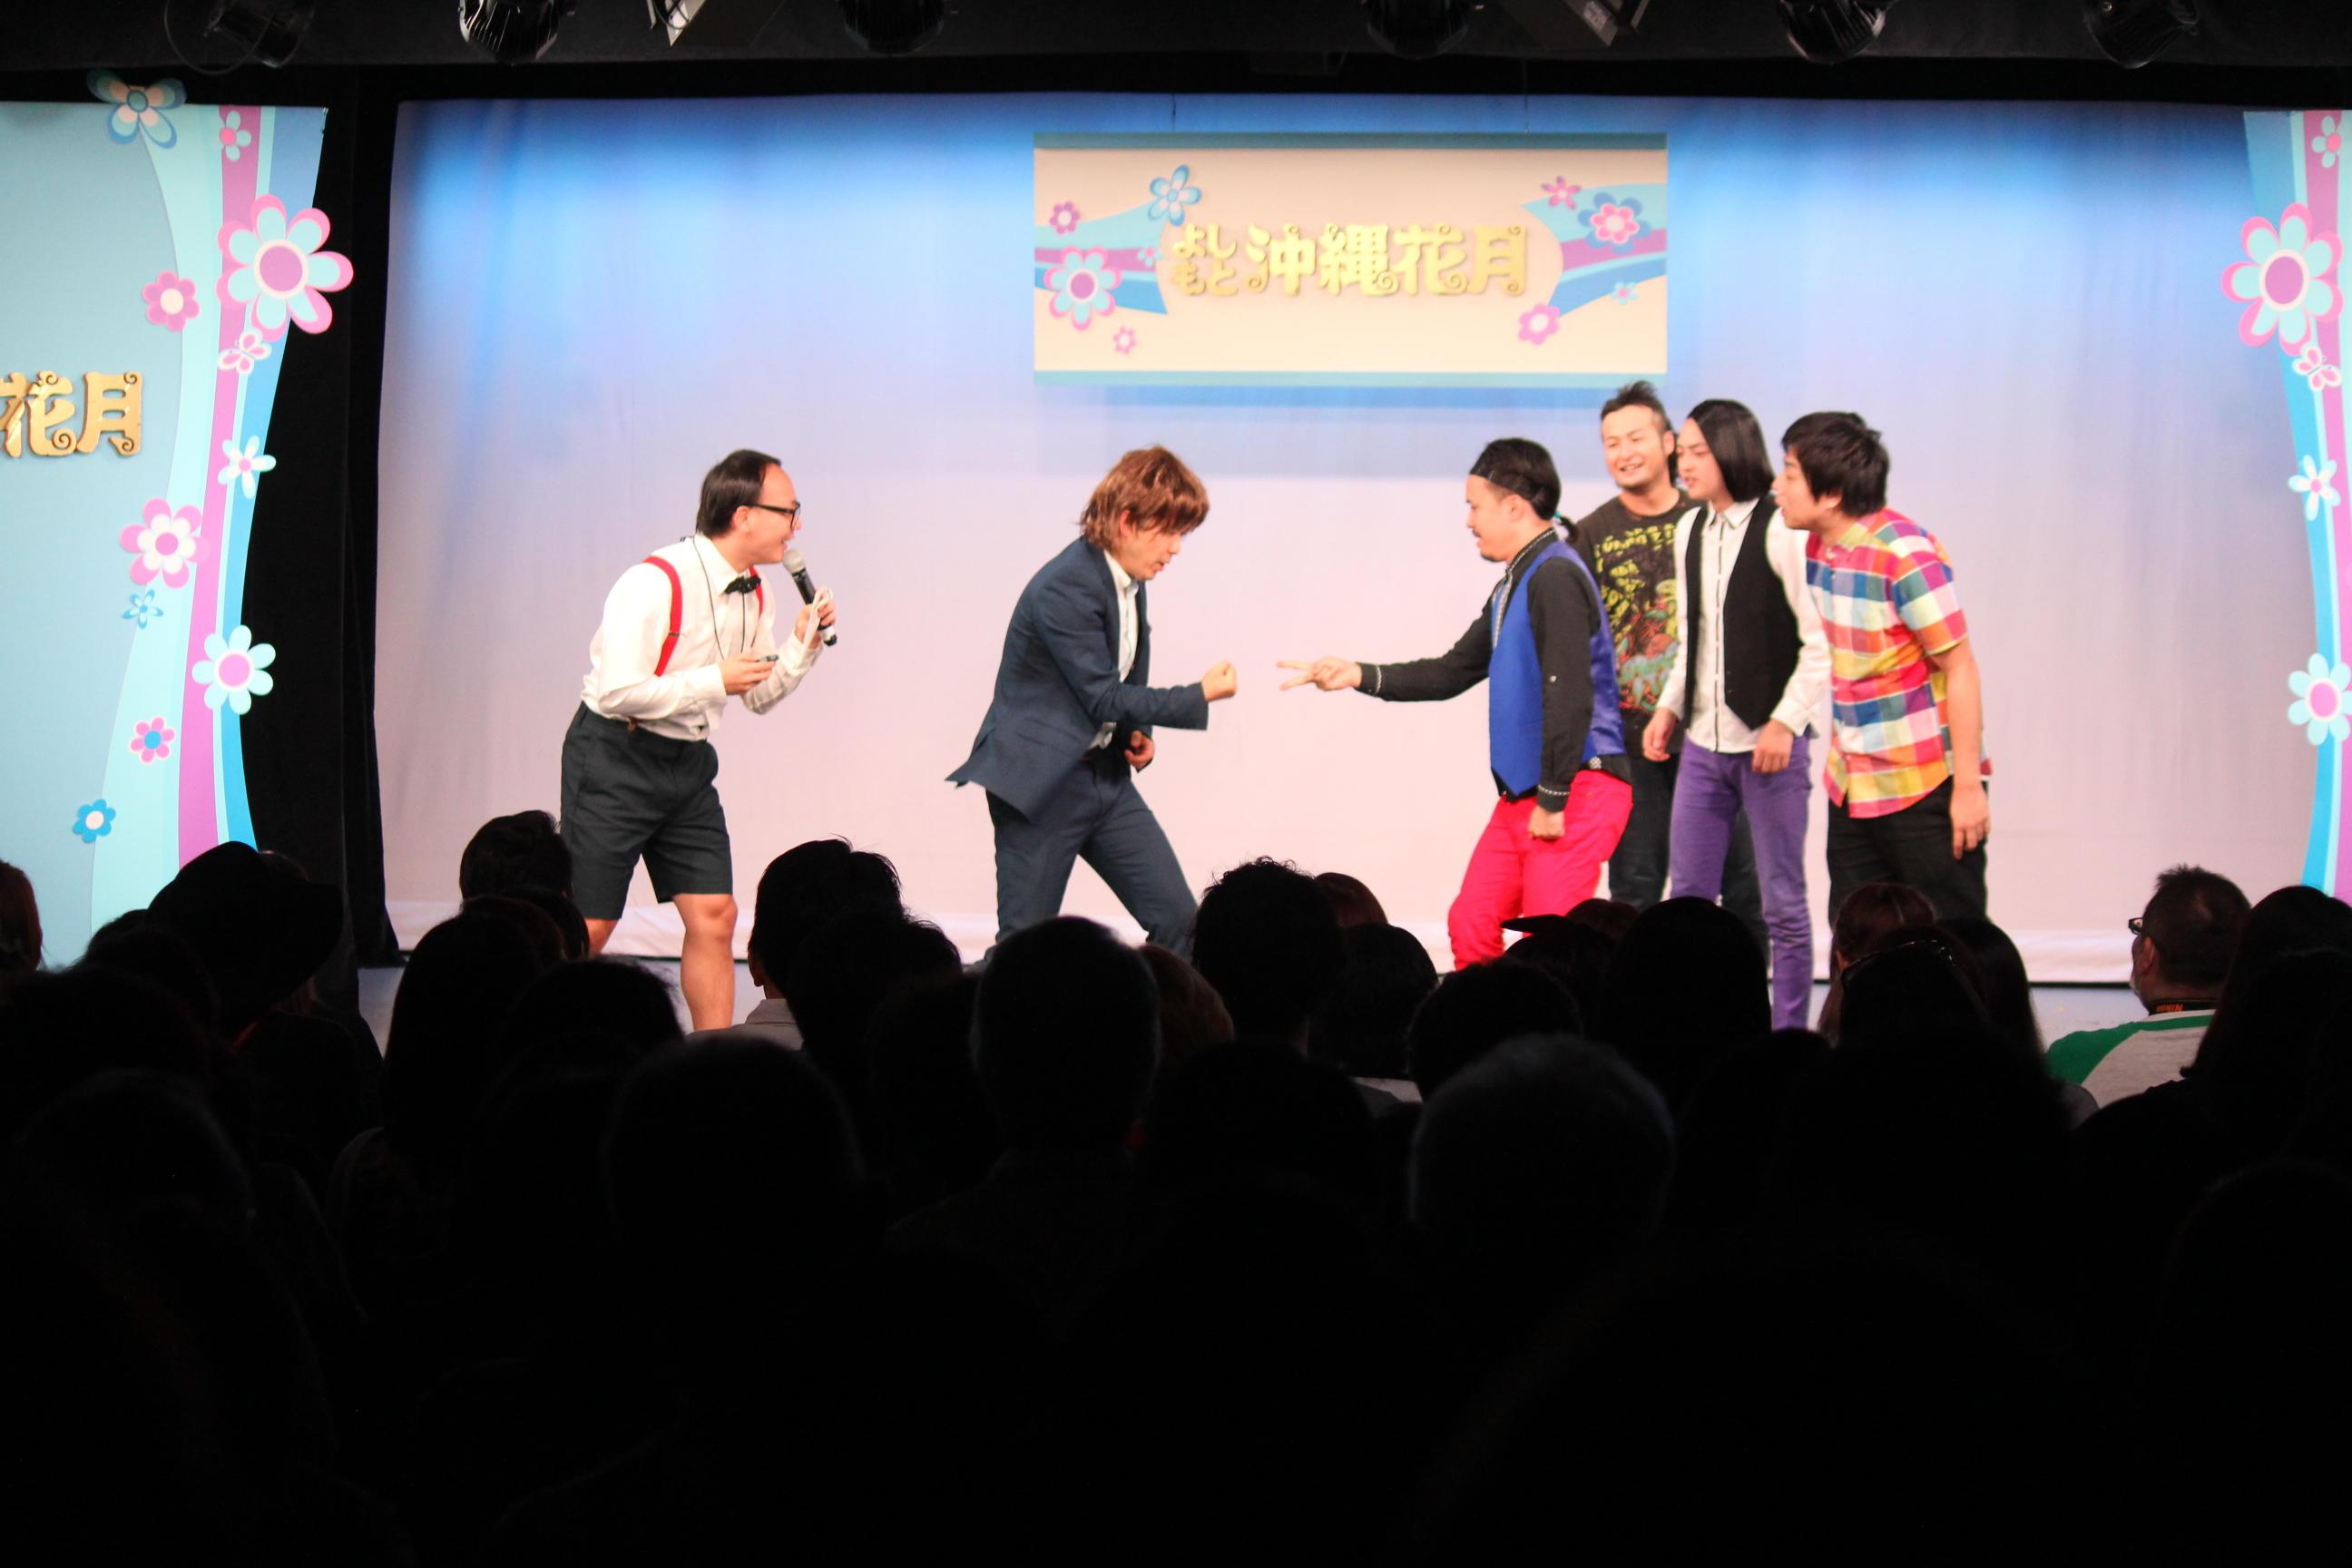 http://news.yoshimoto.co.jp/20151201140850-2eec251d00d103f3f7438dae4645accc198c6e7e.jpg